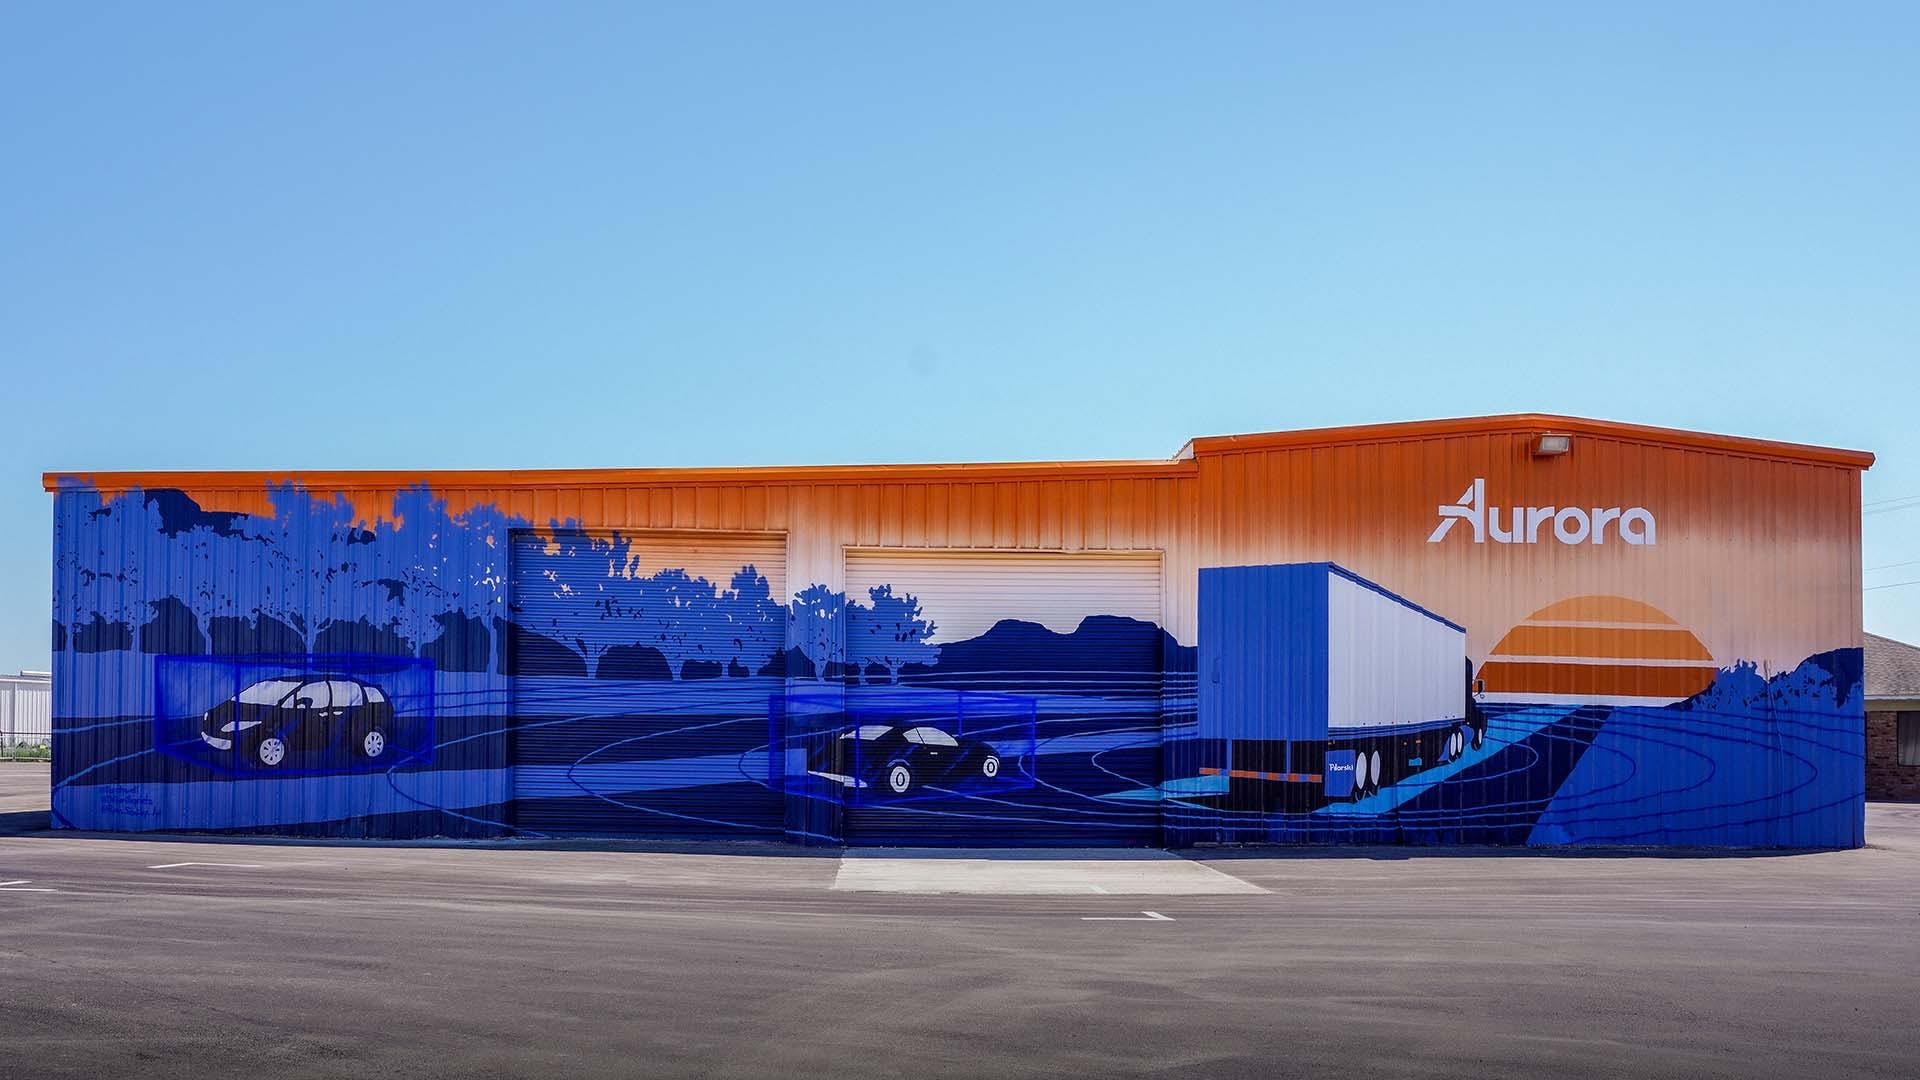 Painted mural at Aurora Illuminated